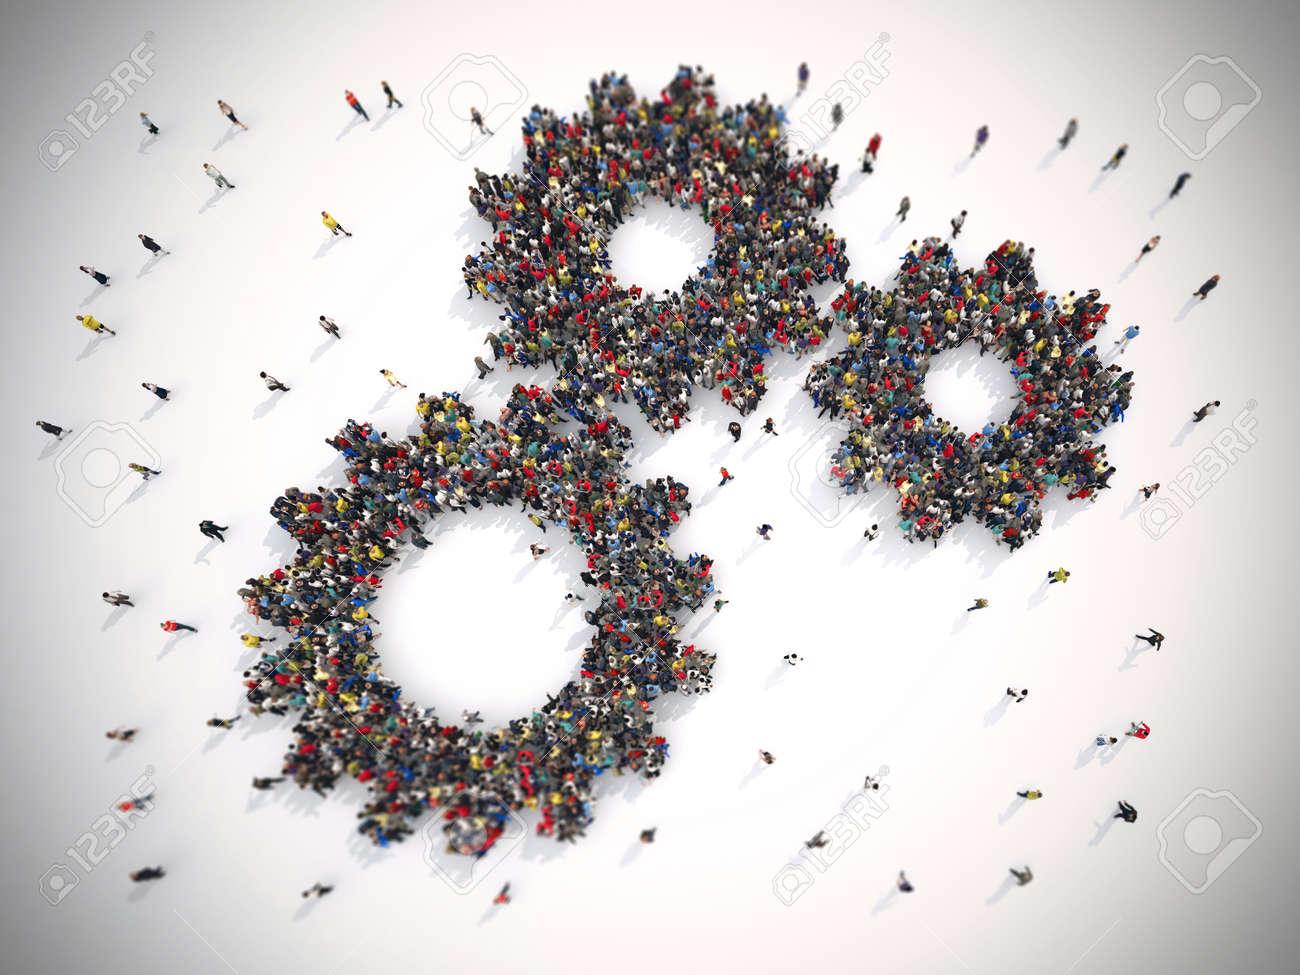 3D Rendering of people united form two gears Standard-Bild - 63498003